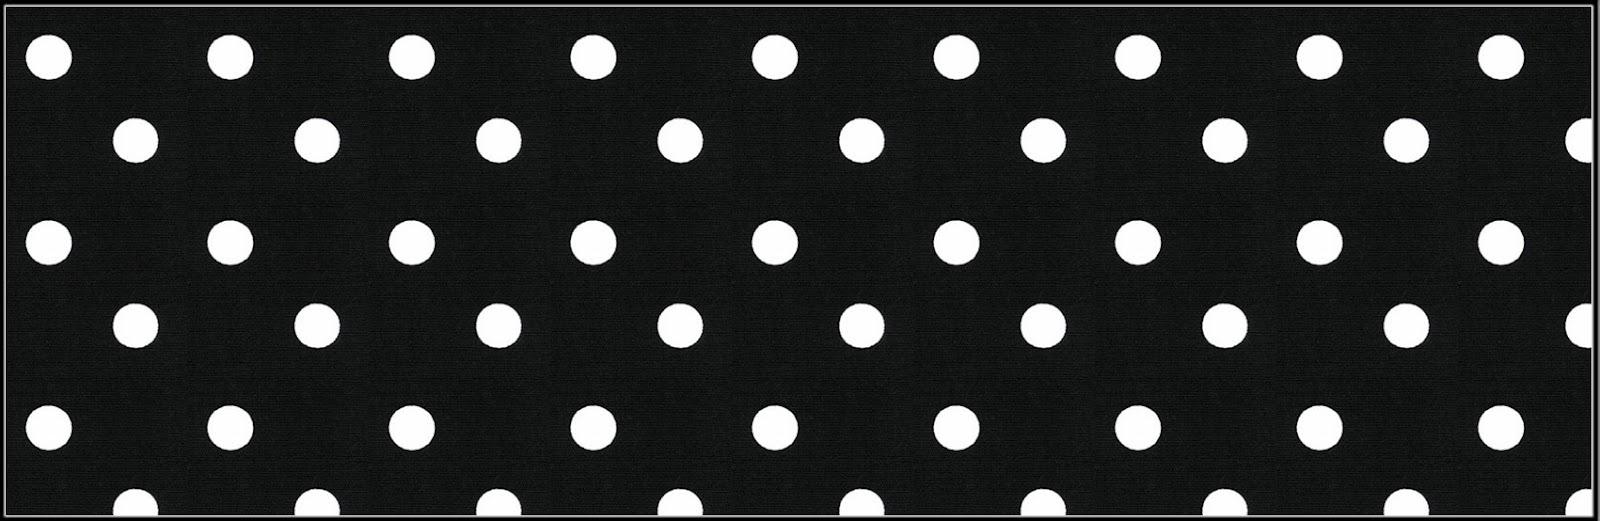 Imprimibles de fondo negro con lunares blancos 5 ideas for Fondo de pantalla lunares